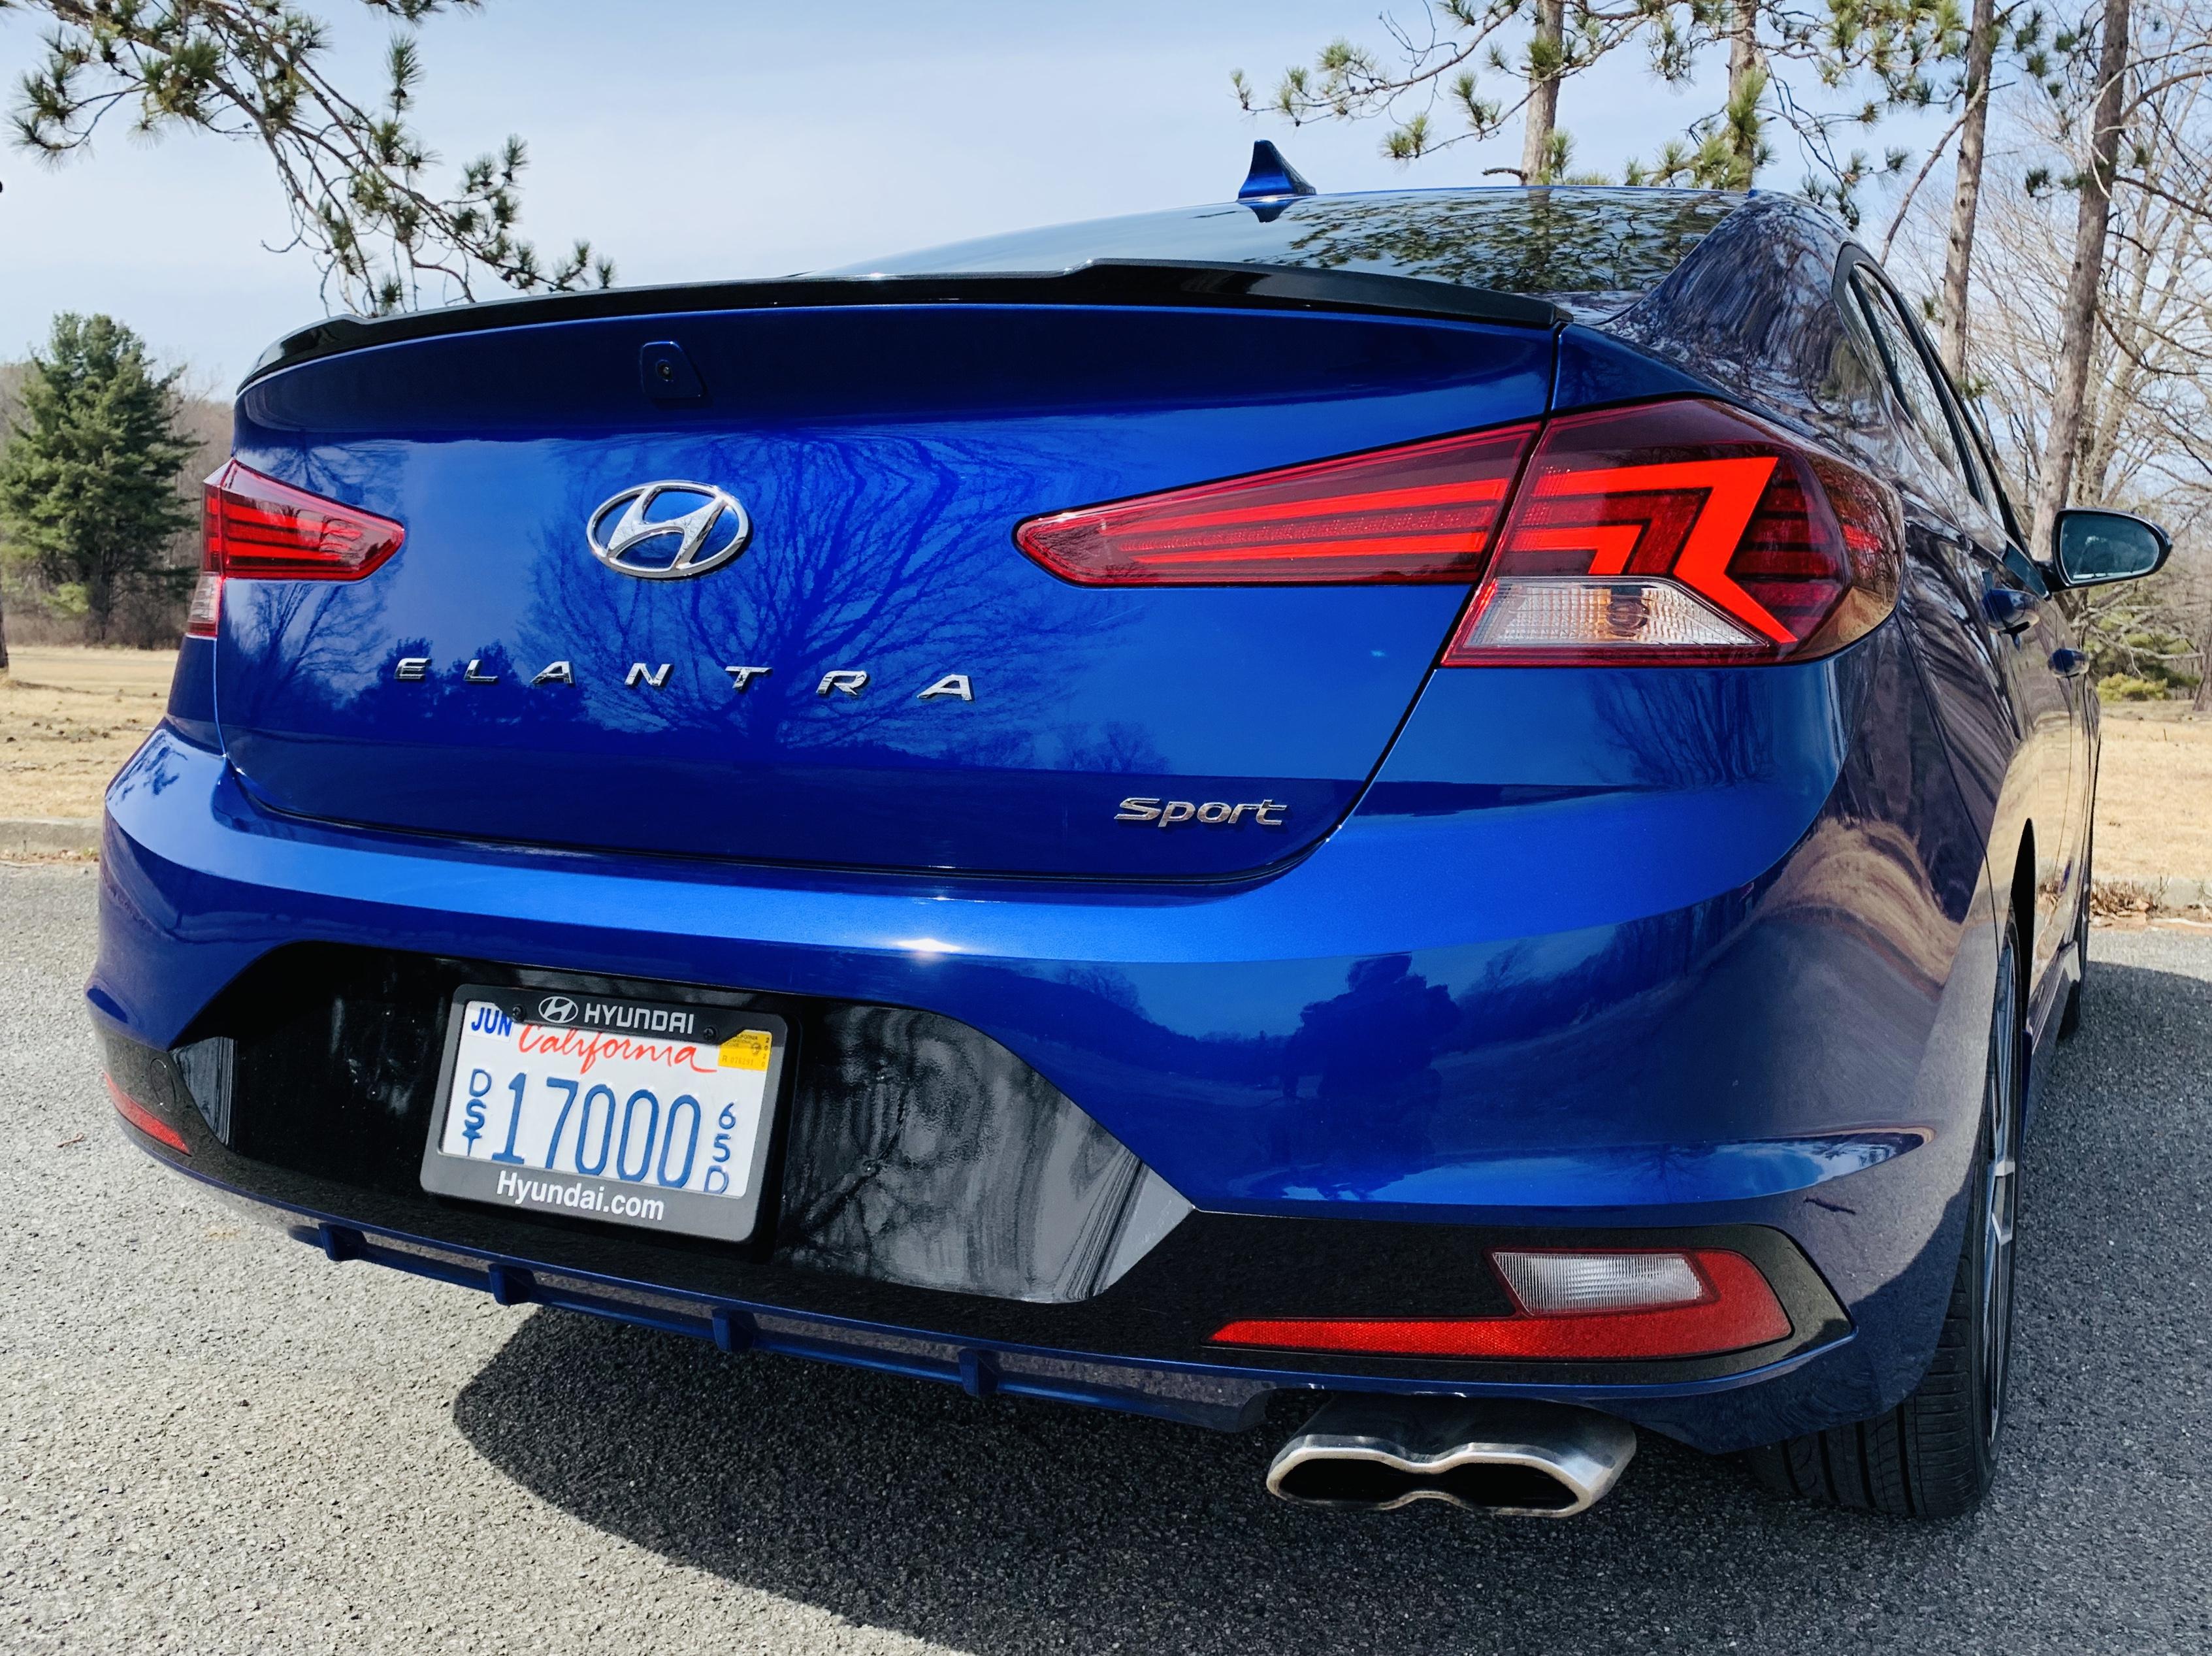 019 Hyundai Elantra Sport Review By Auto Critic Steve Hammes